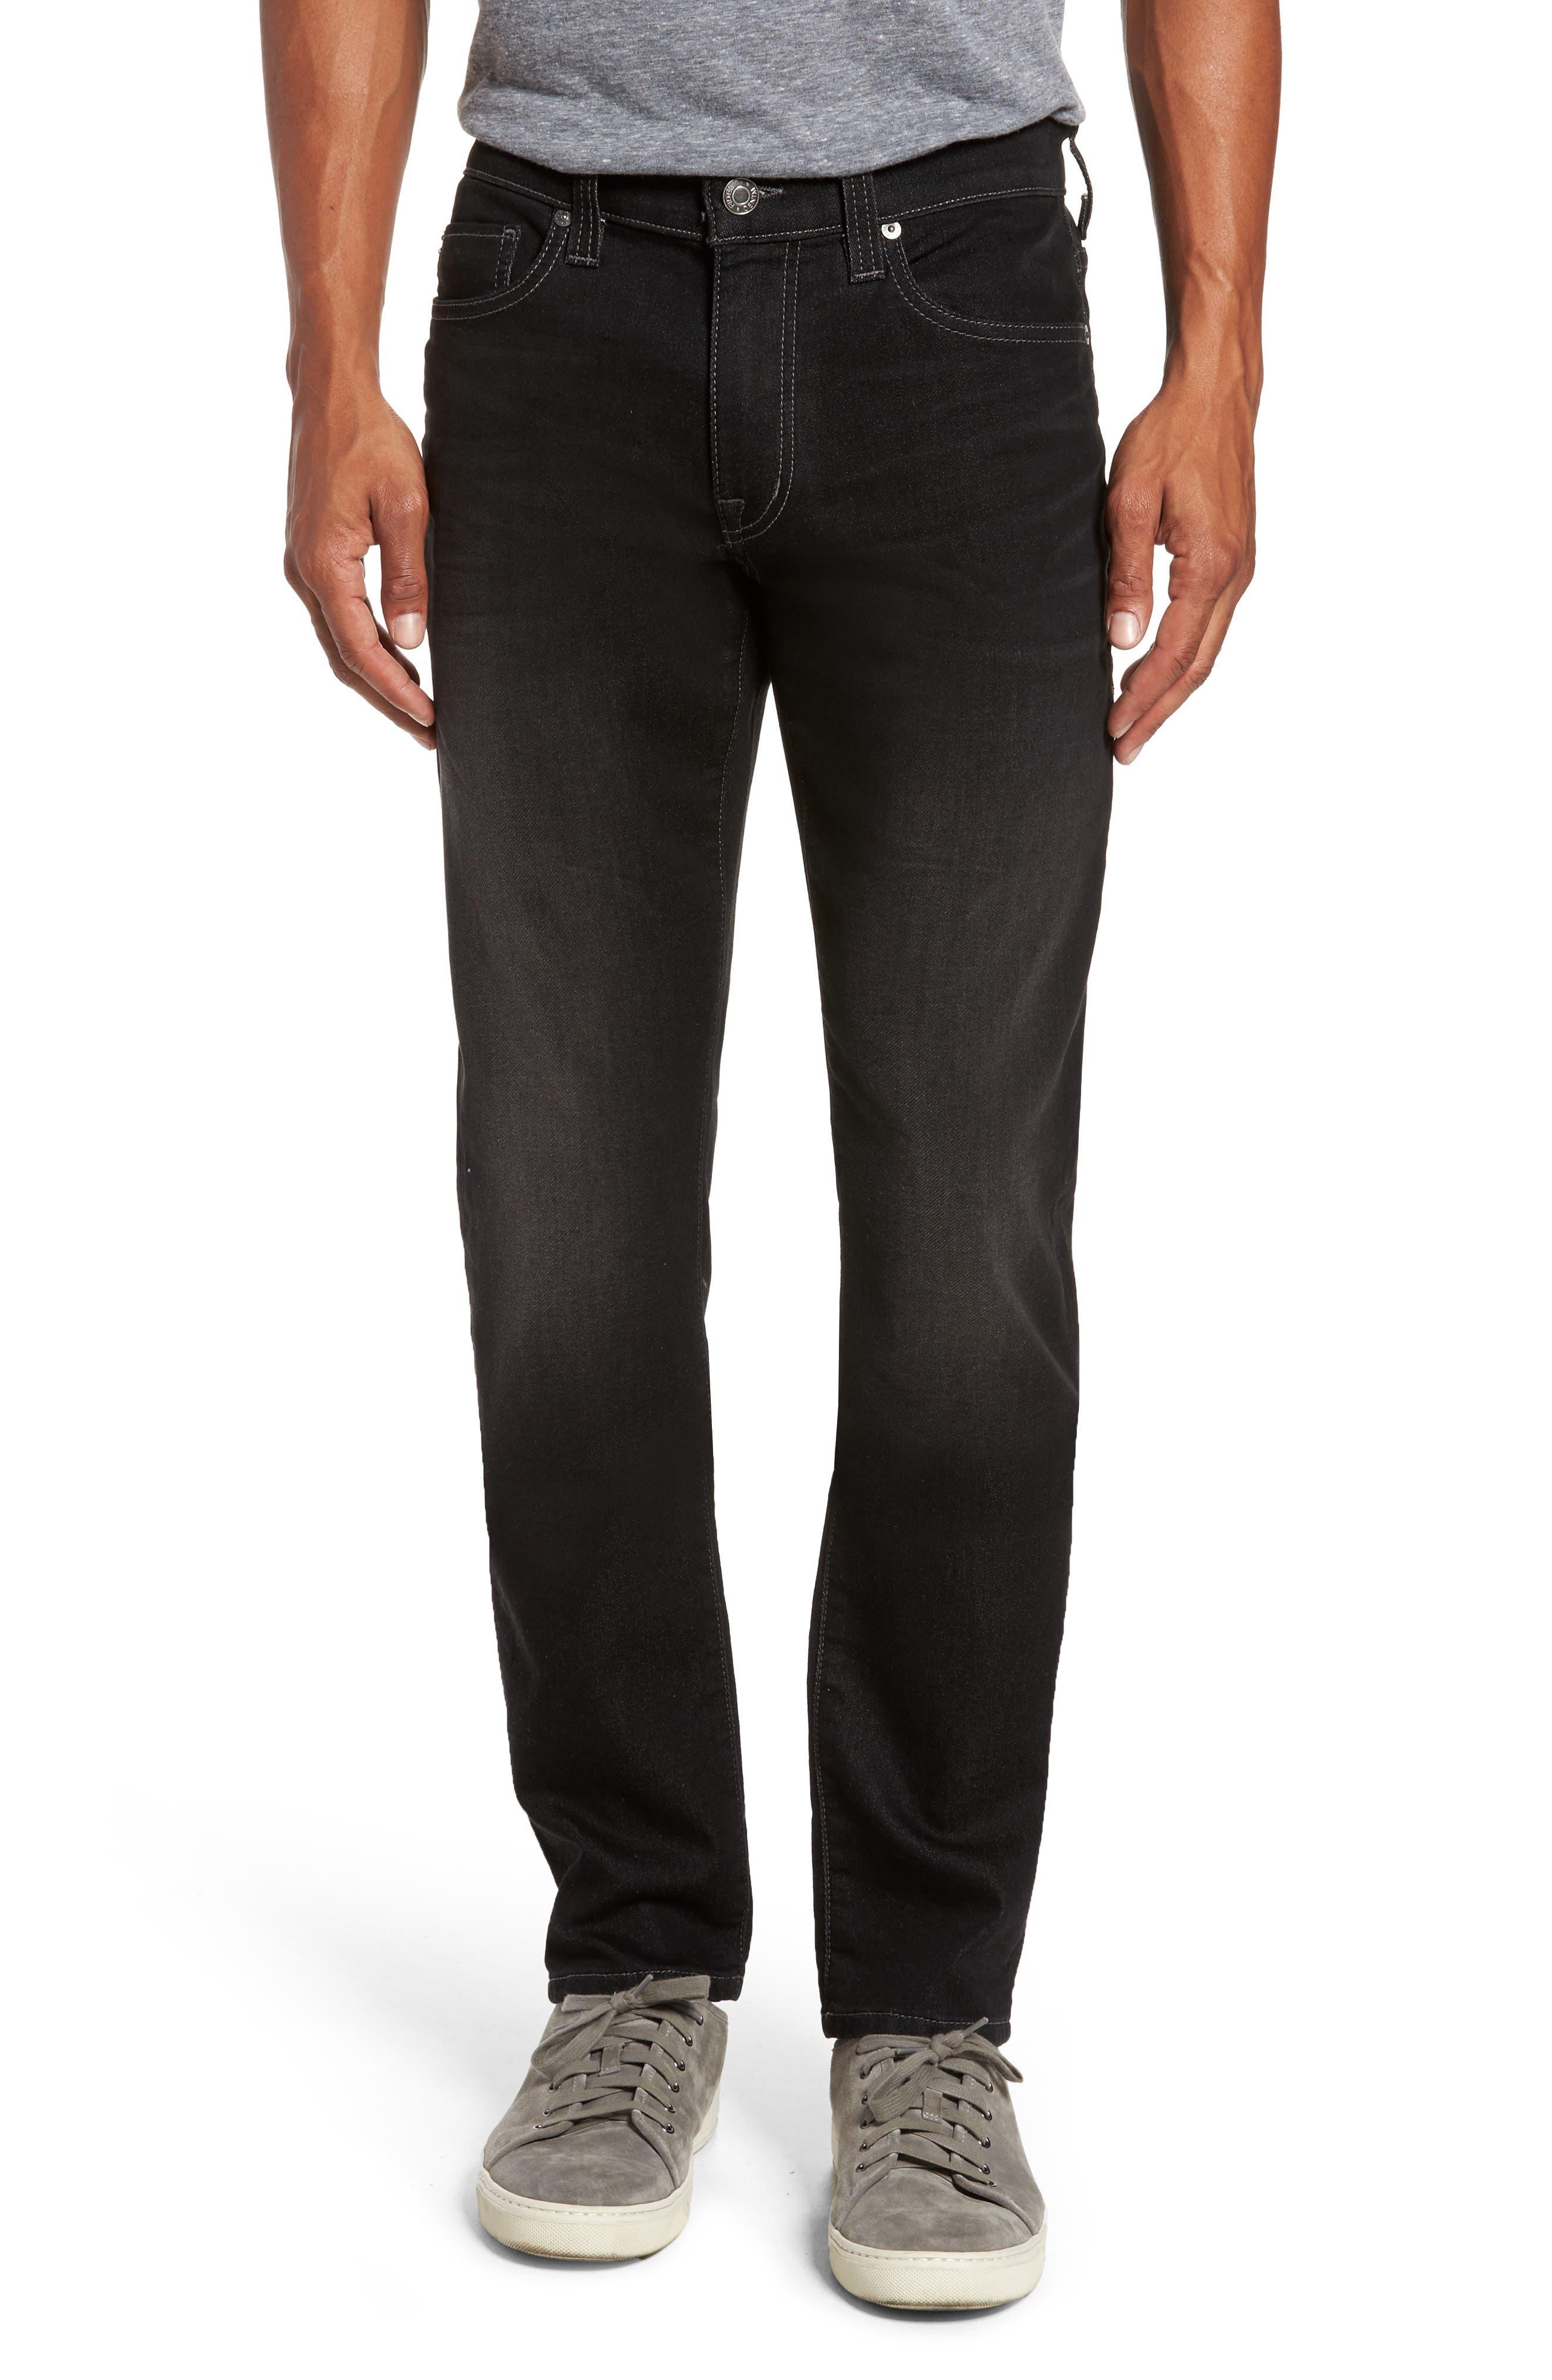 Fidelity Denim Torino Slim Fit Jeans (Oxy Black on Black)